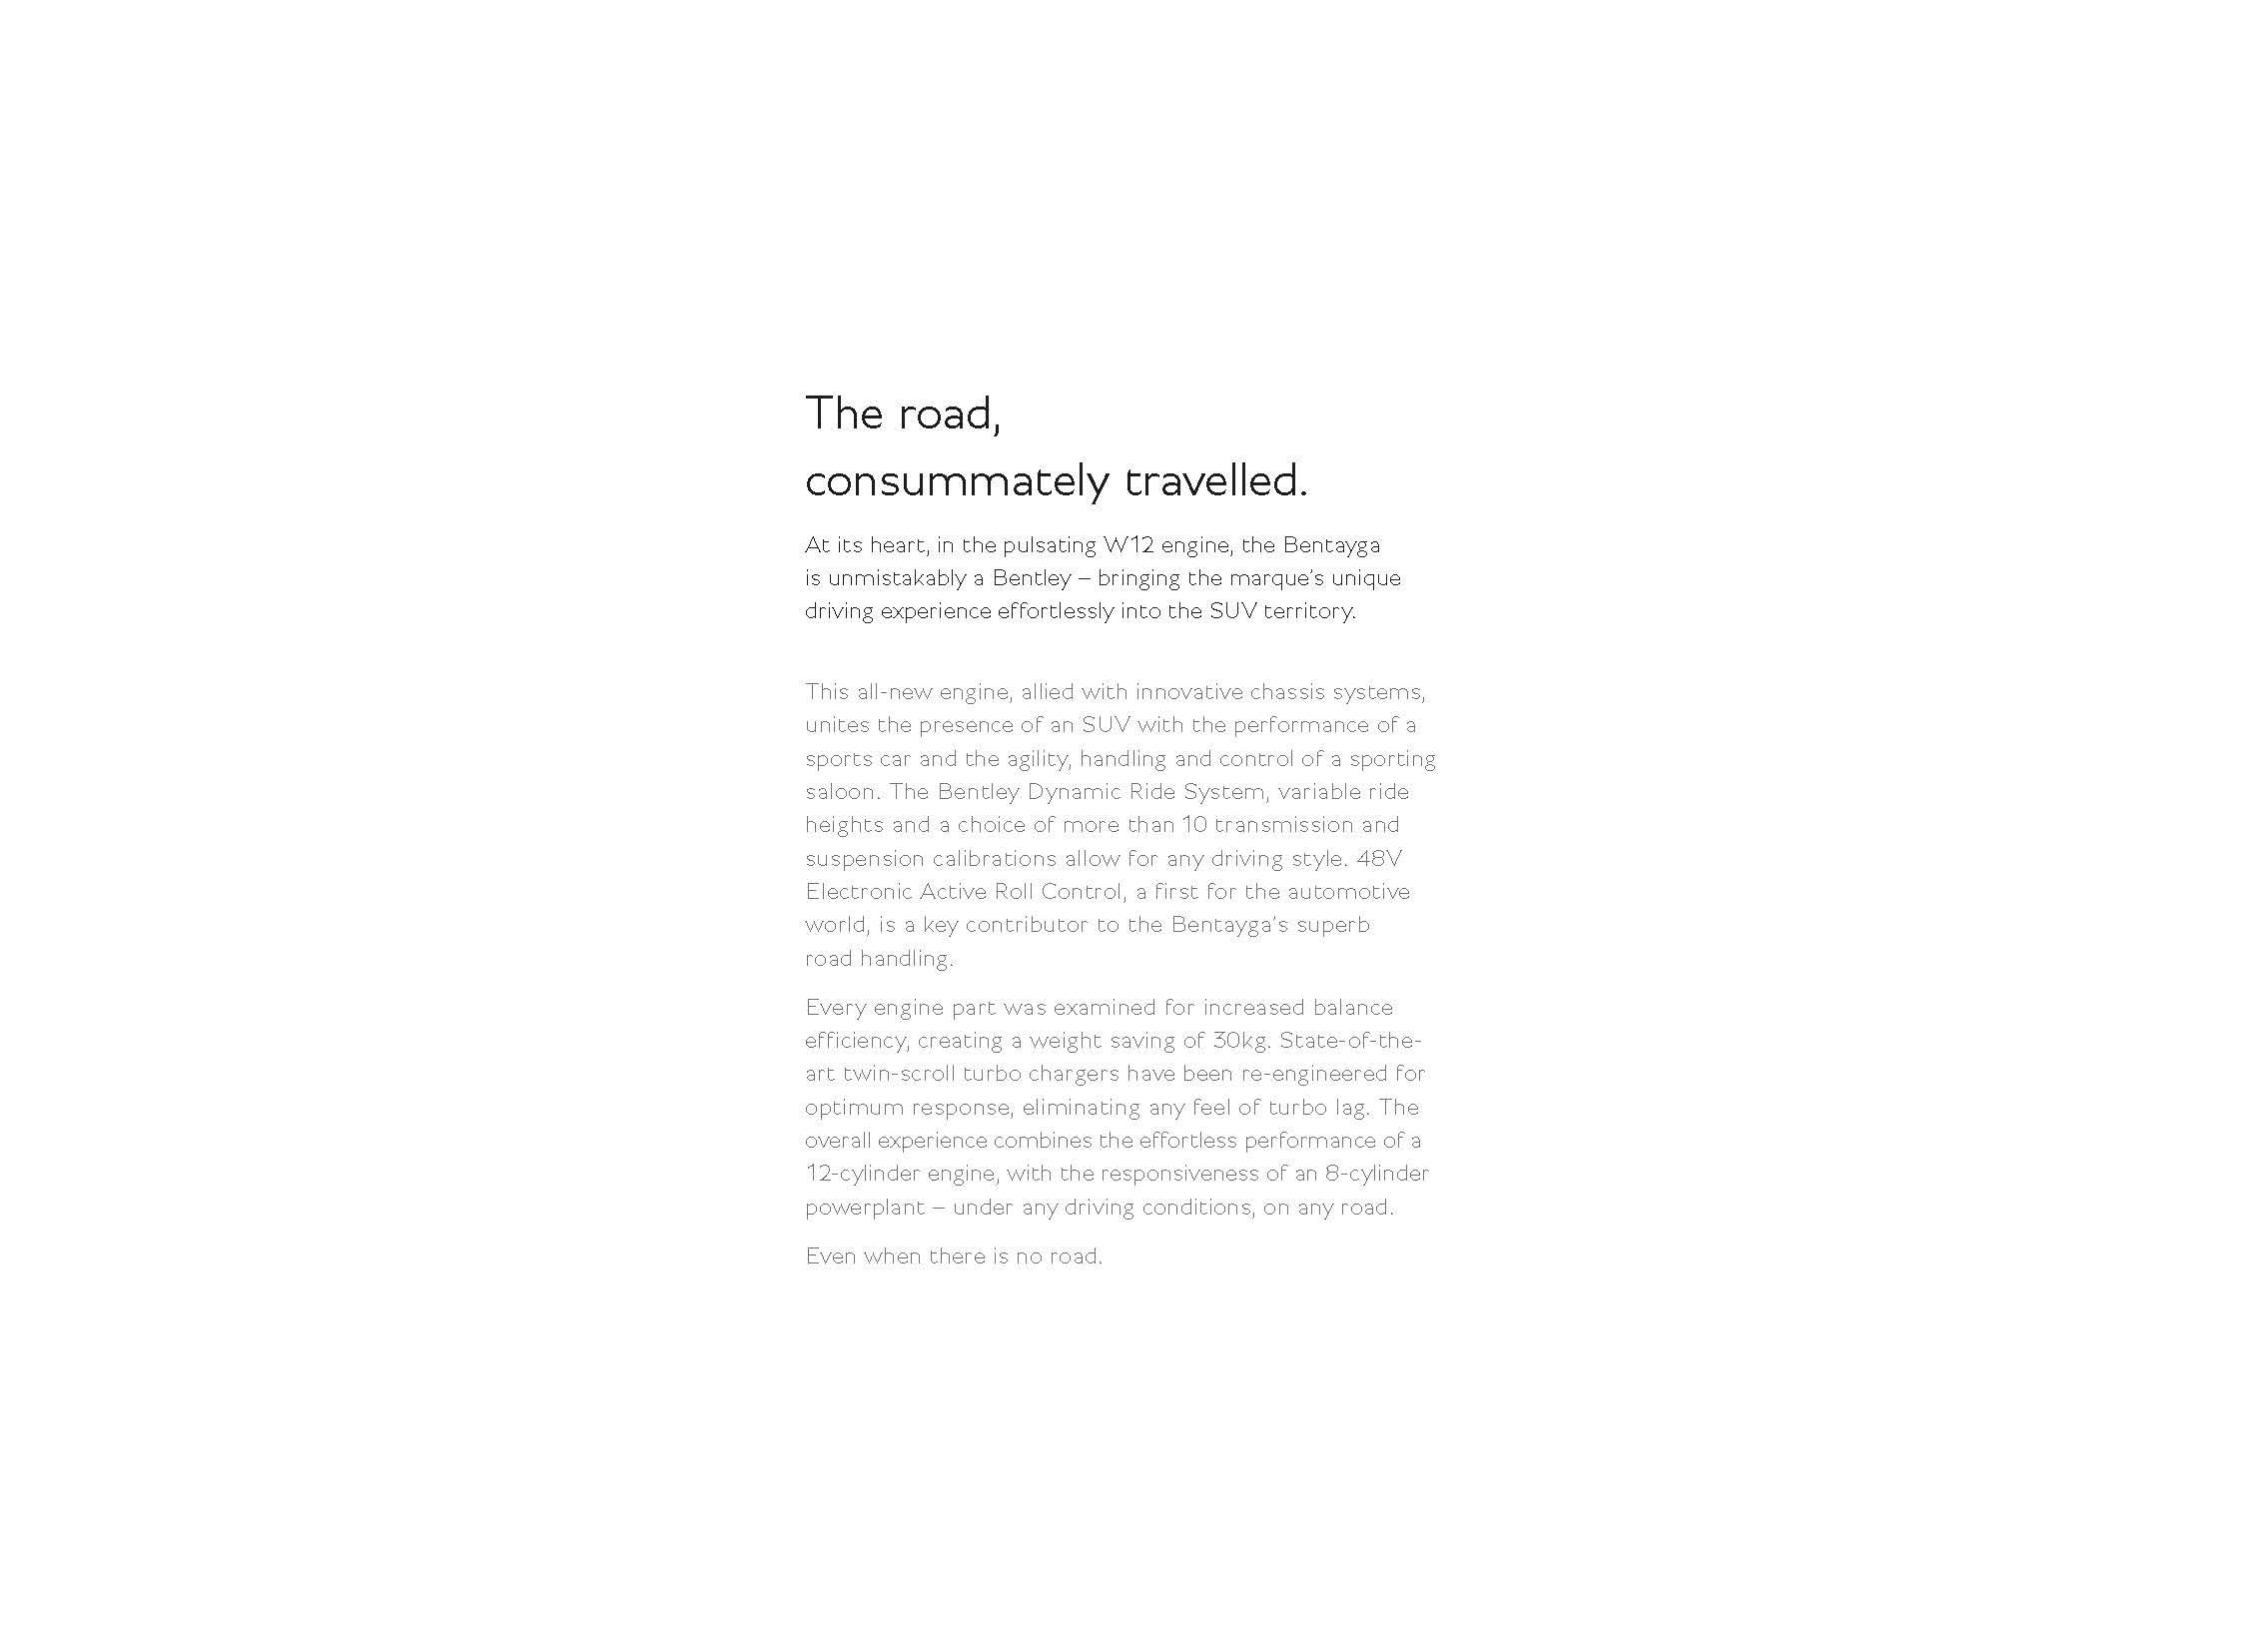 Bentley Bentayga Brochure _Page_33.jpg